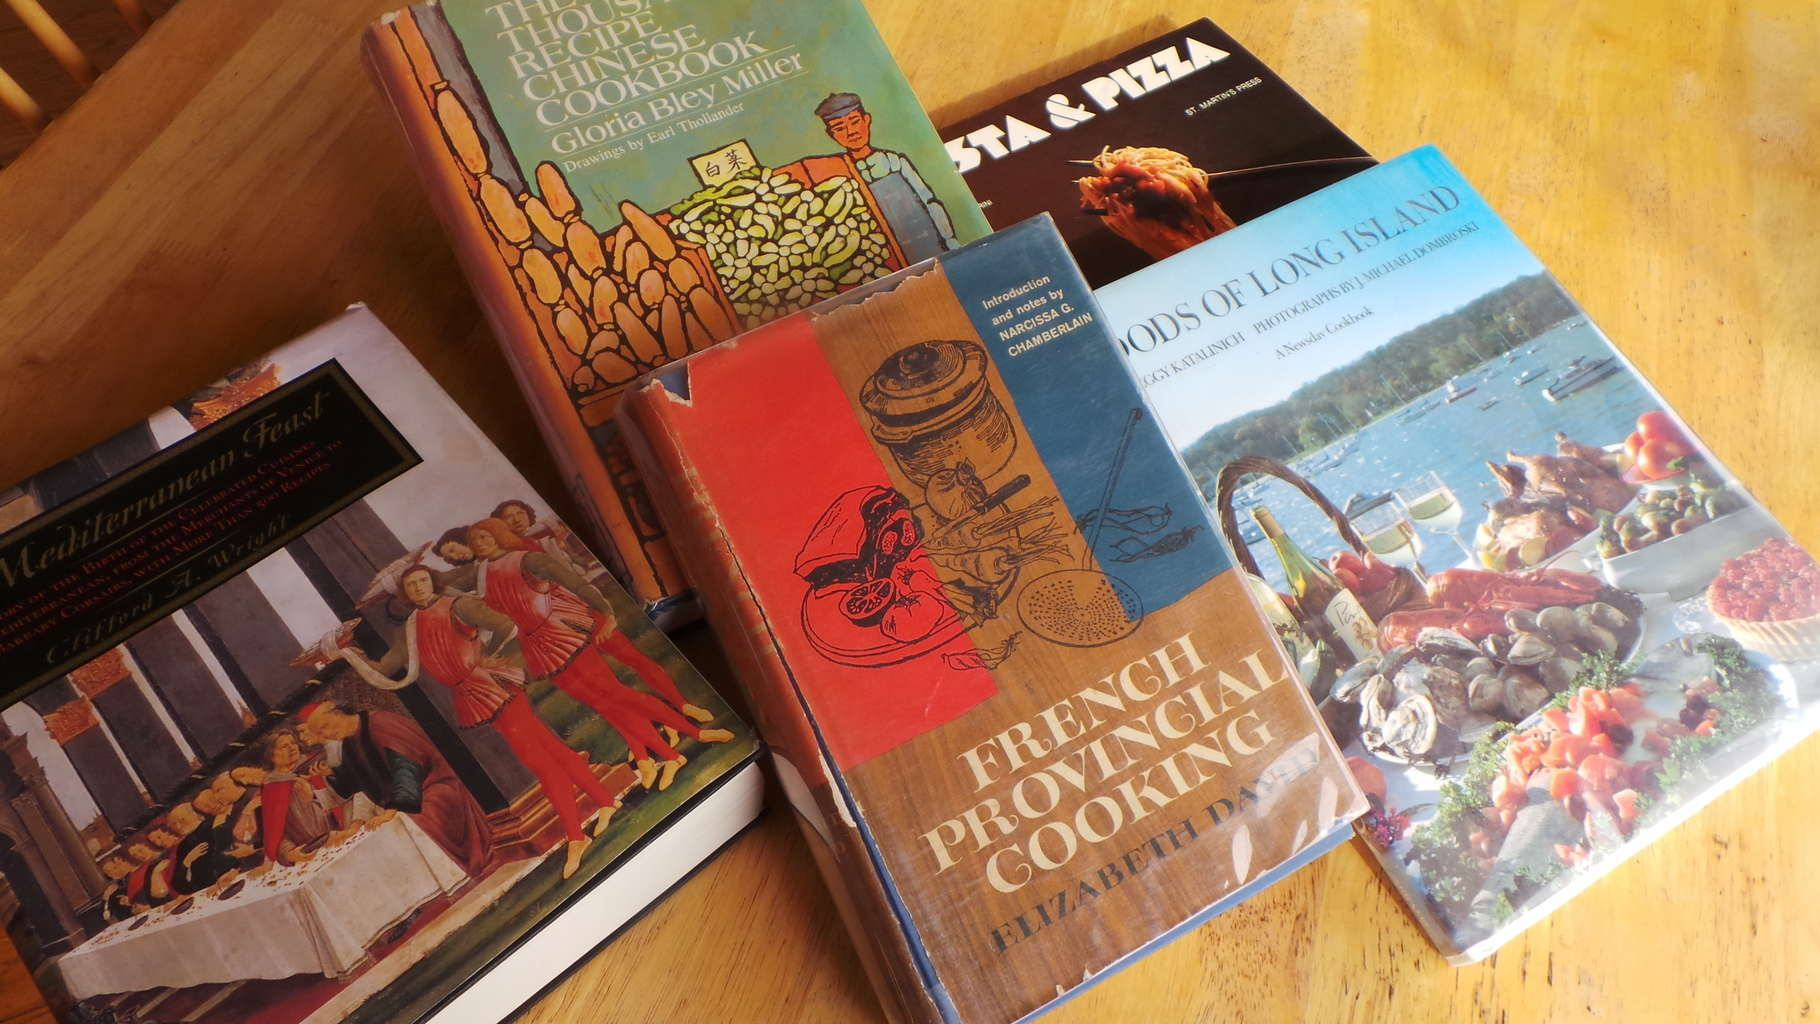 Christmas Cookbook Gifts (Zester)